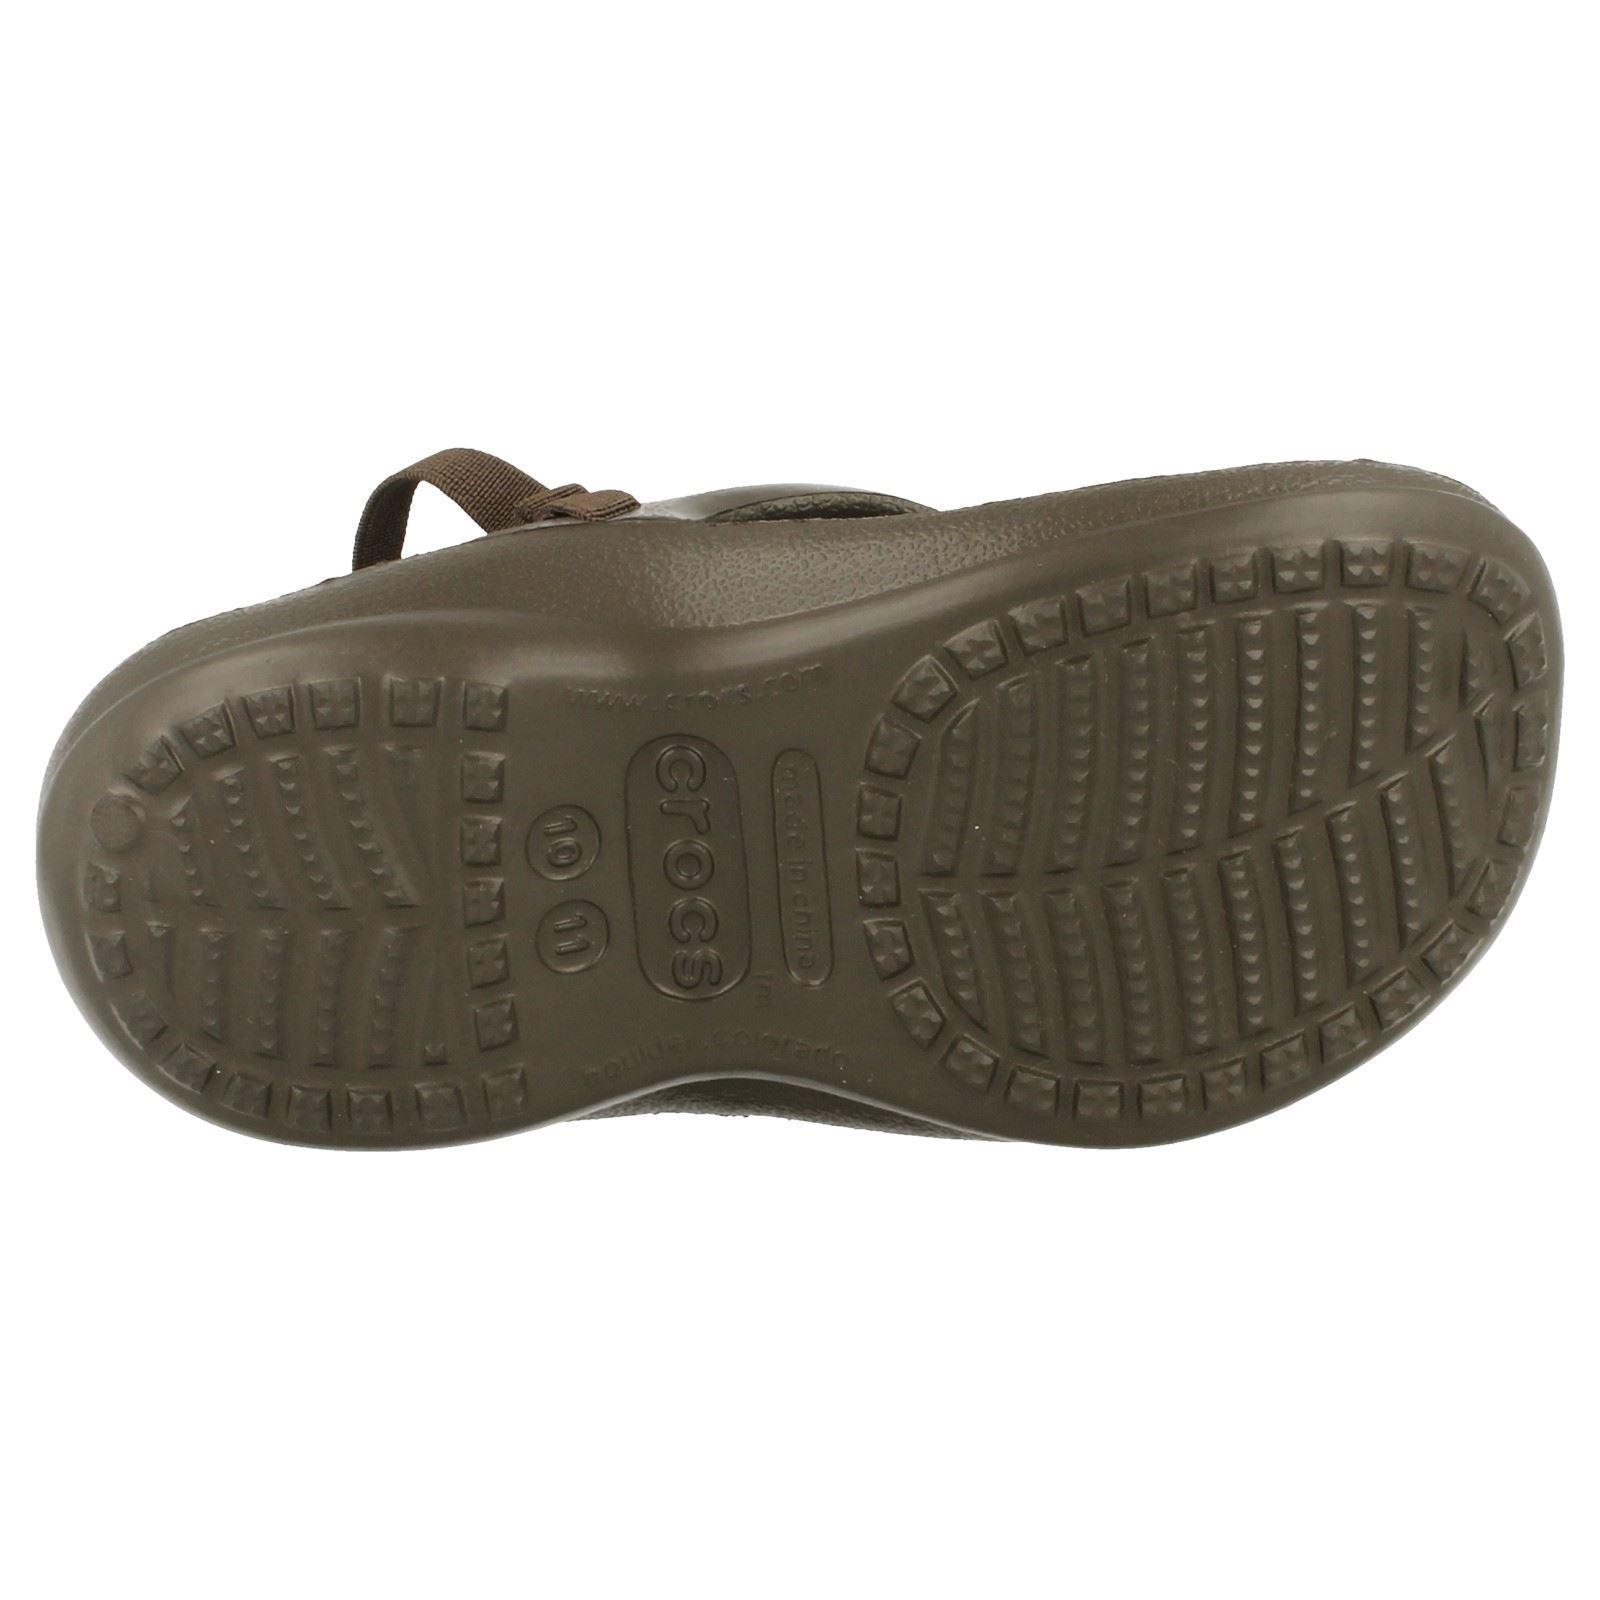 Childrens Unisex Crocs 'Athens' Slingback Toe Posts ~ K